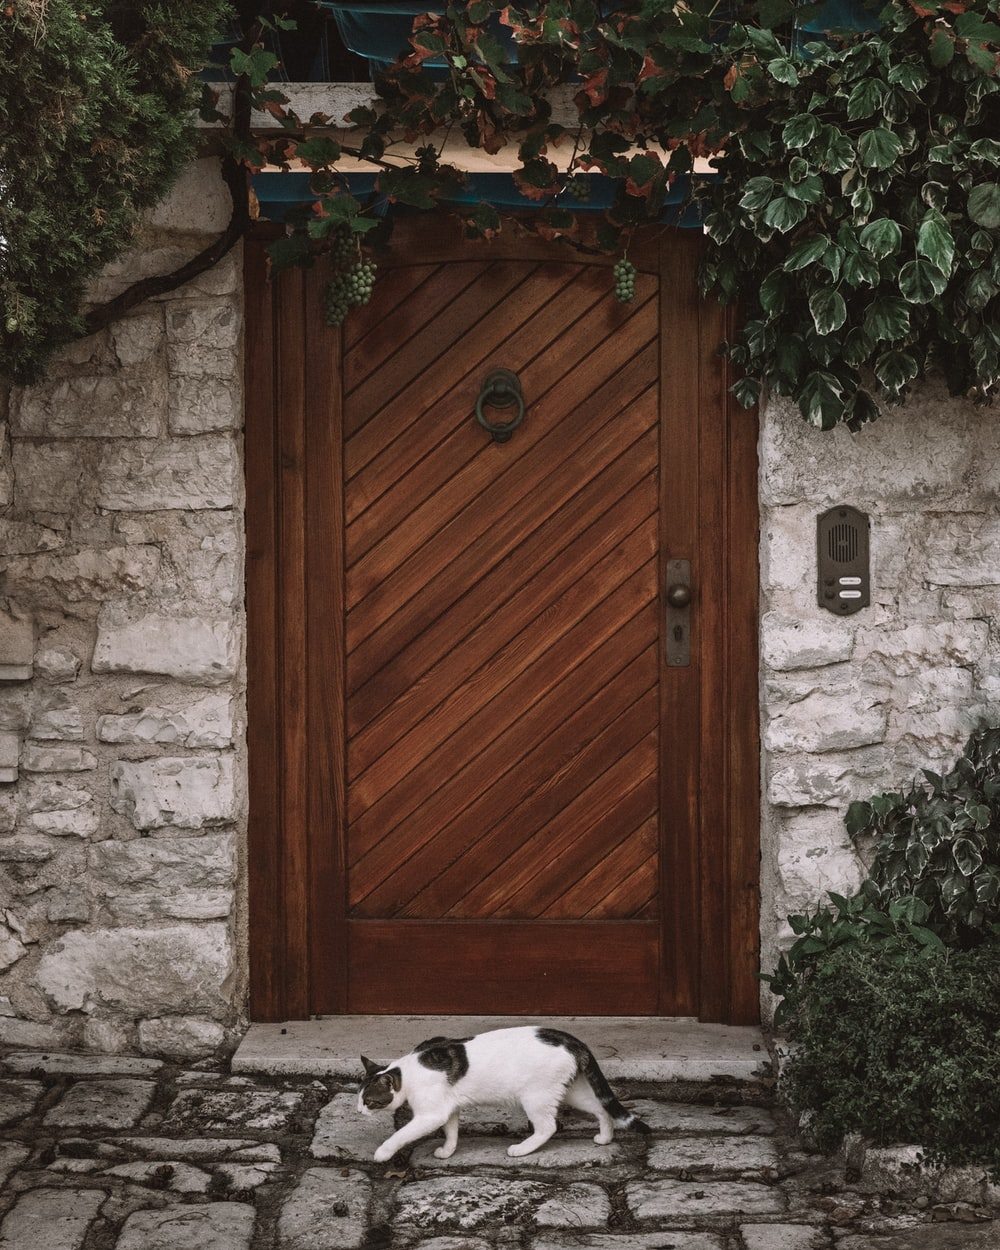 white and black cat walking next to brown wooden door